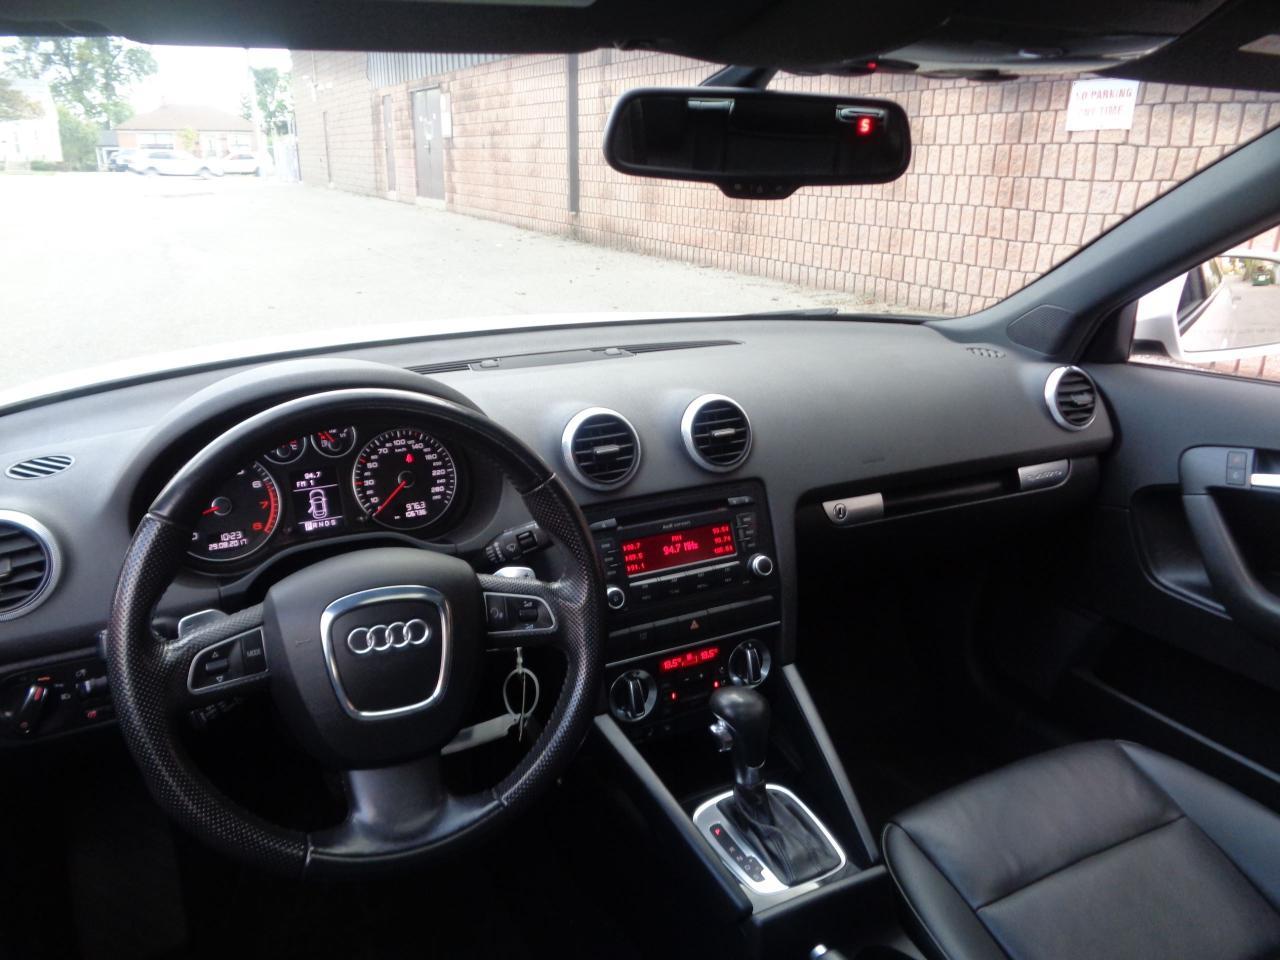 2009 Audi A3 ***SOLD***